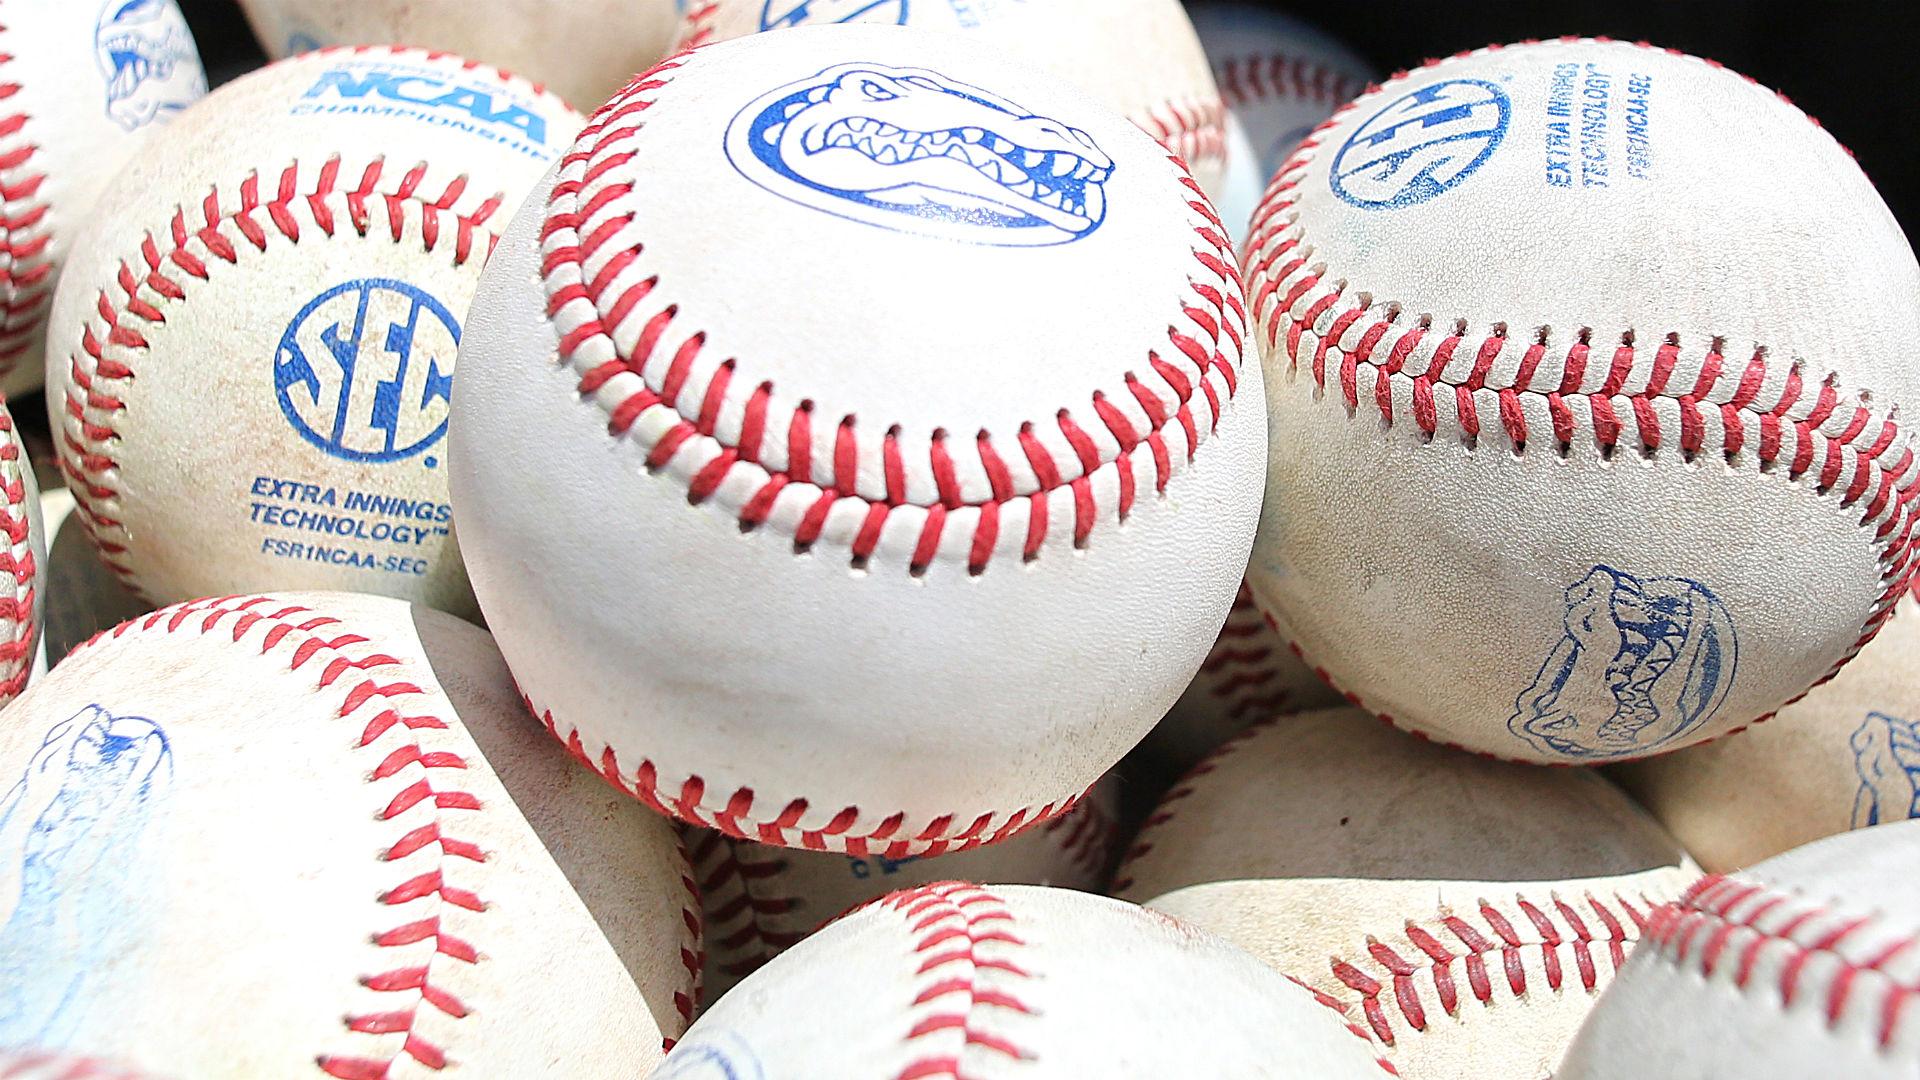 Florida-CWS-baseballs-062015-Casey-FTR.jpg